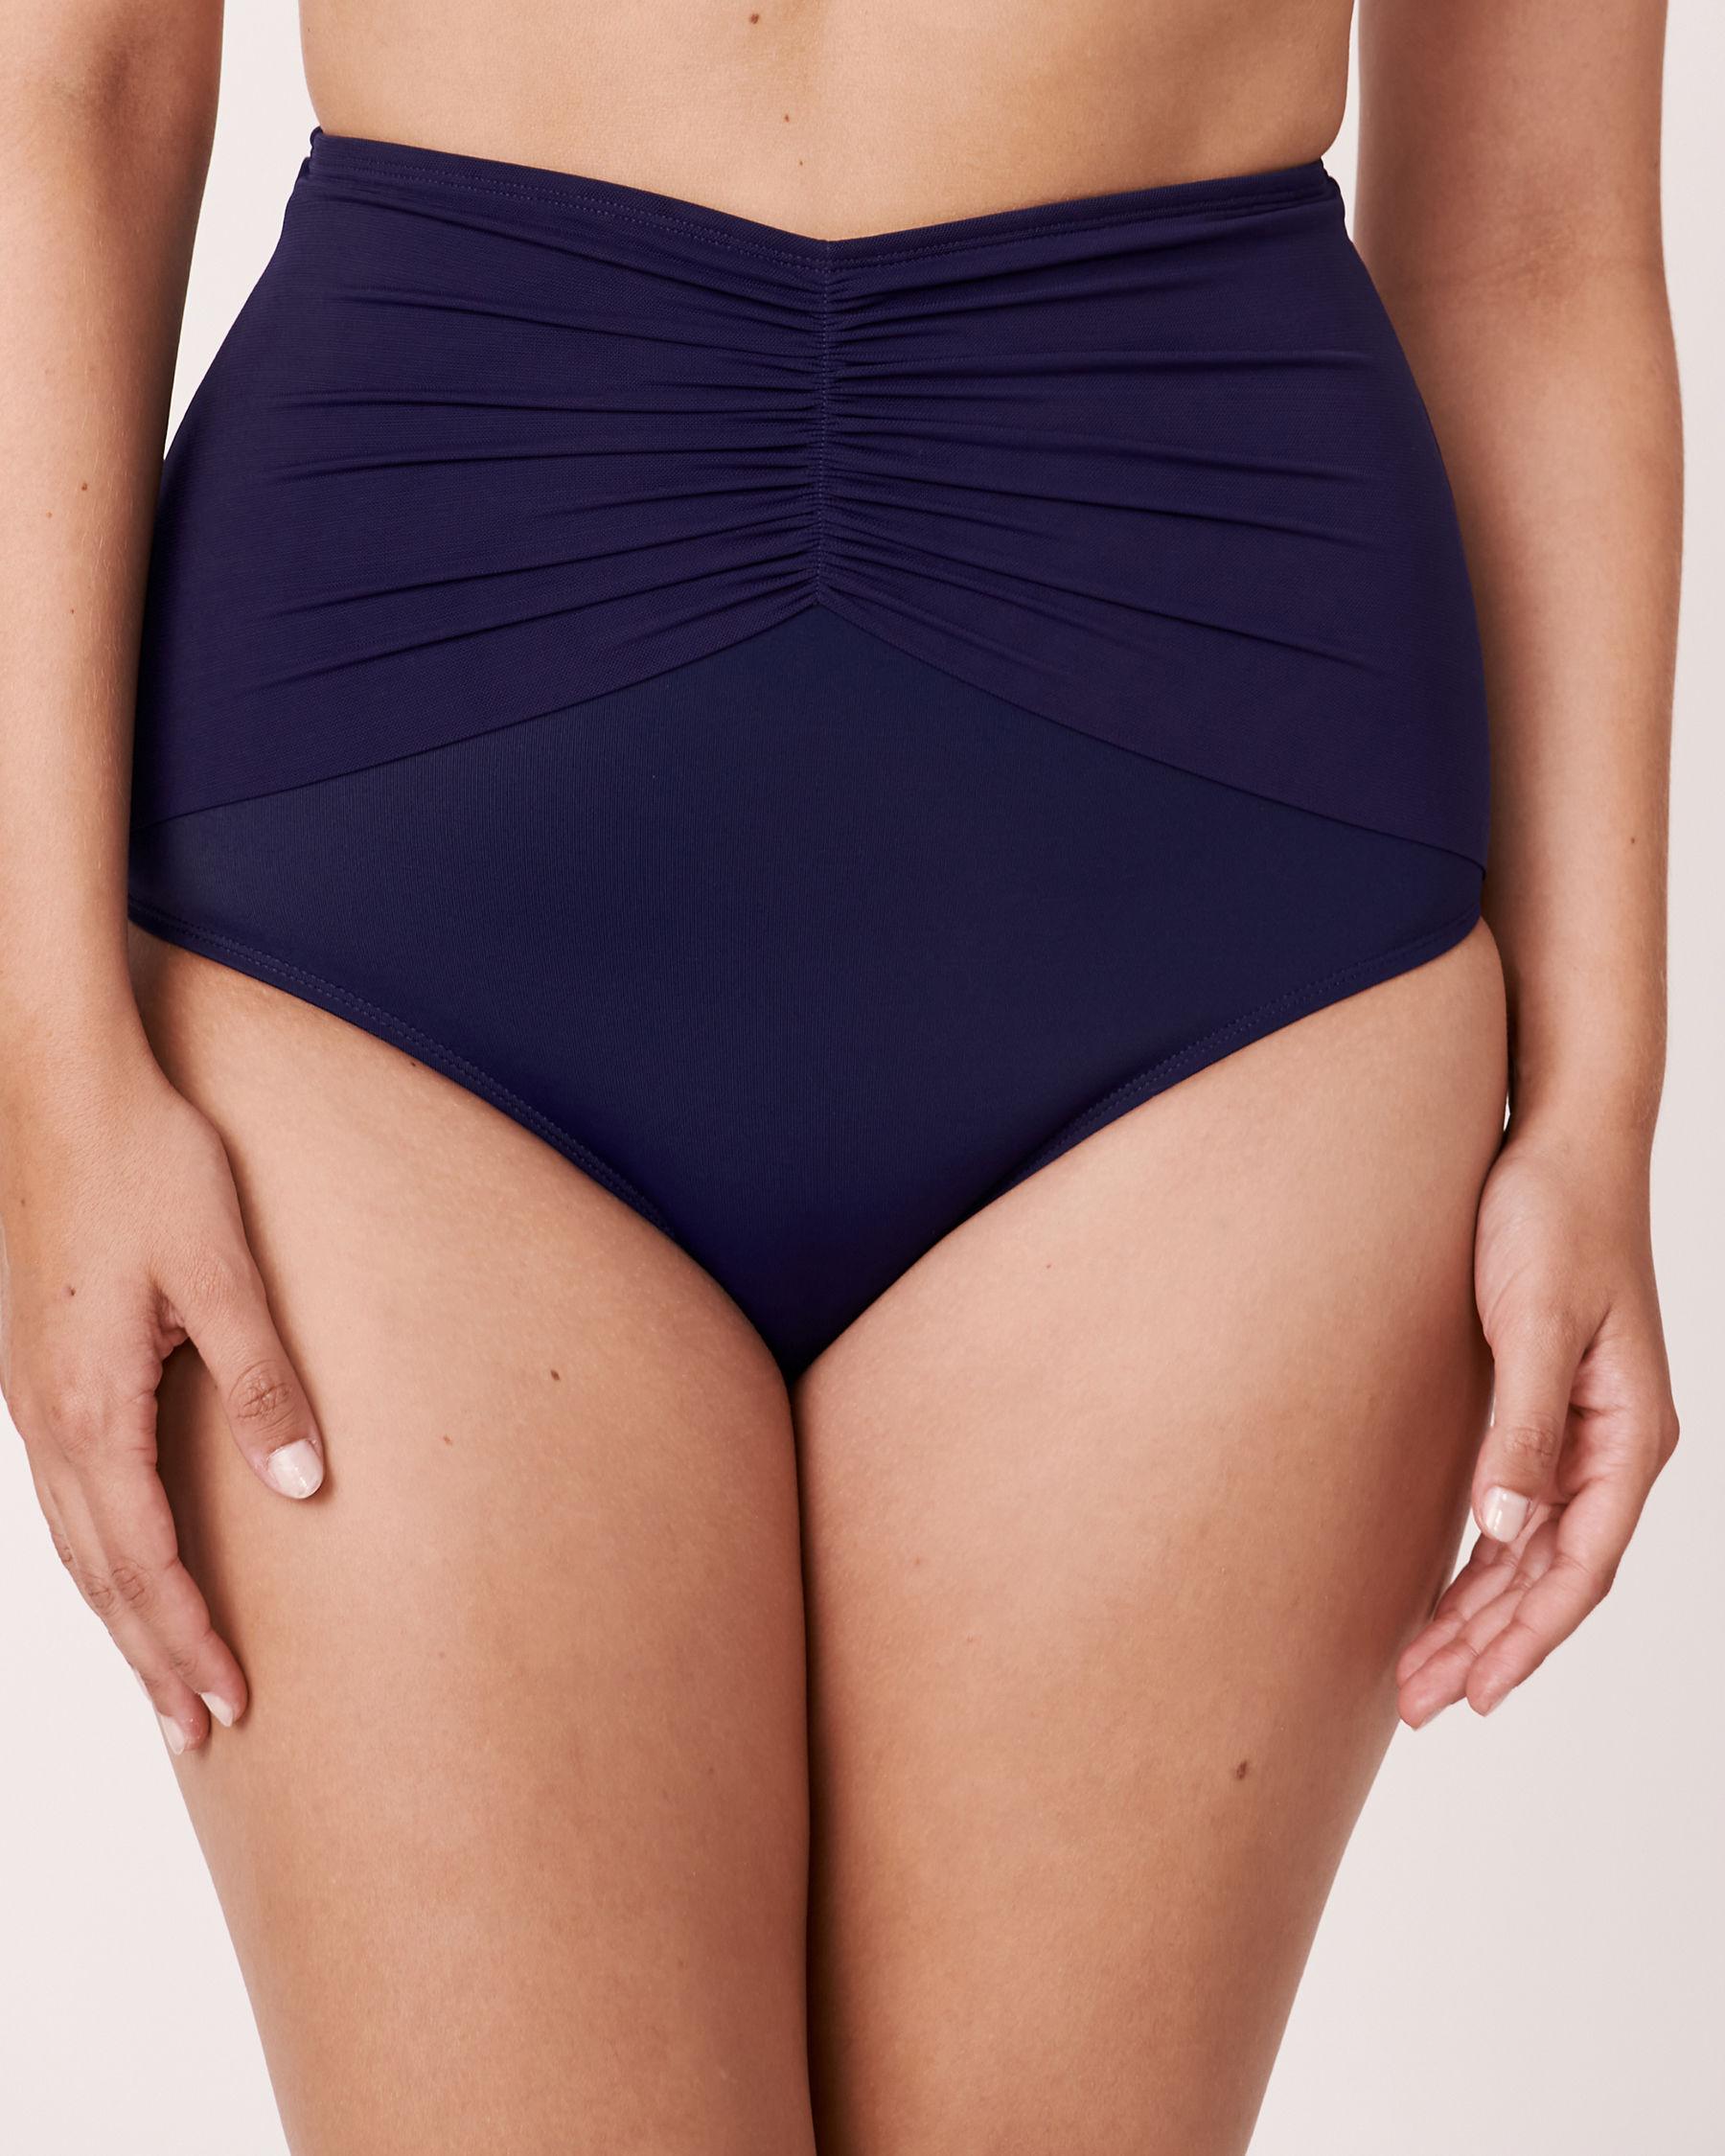 LA VIE EN ROSE AQUA SOLID Gathered High Waist Bikini Bottom Blue 669-691-1-0P - View1